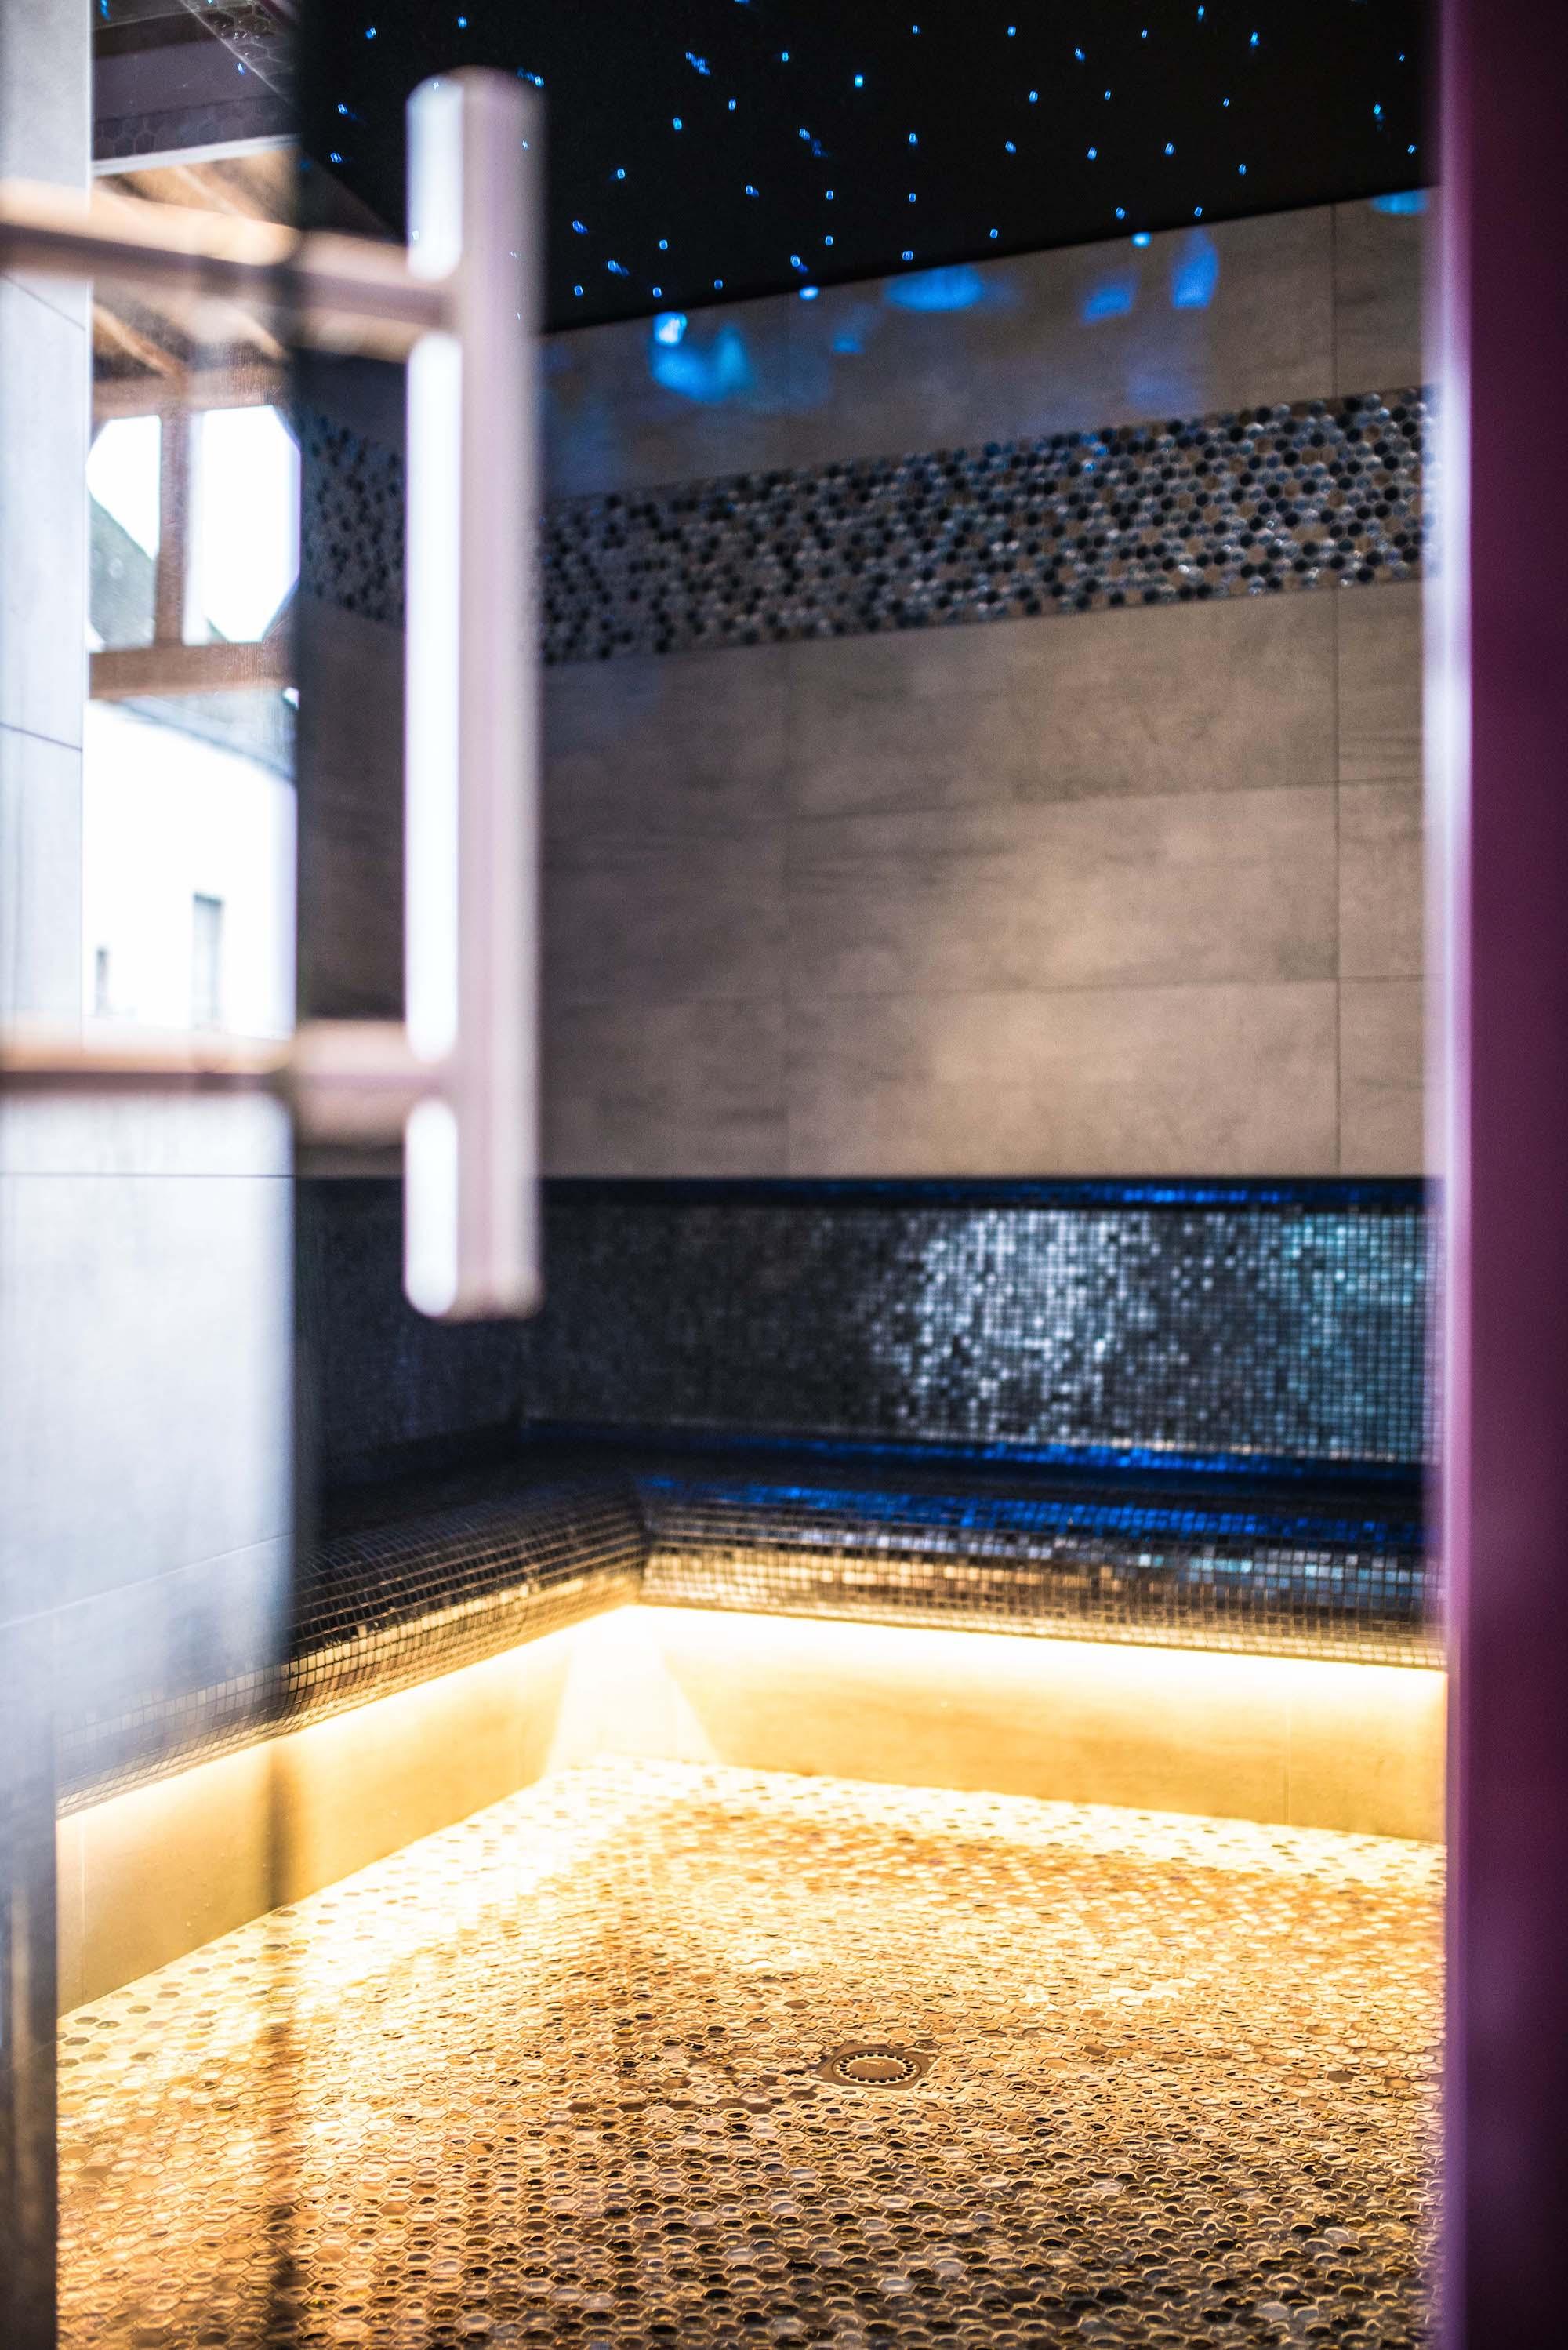 brunch et spa h2o coffret cadeau en r gion bourgogne franche comt beaune cedex. Black Bedroom Furniture Sets. Home Design Ideas